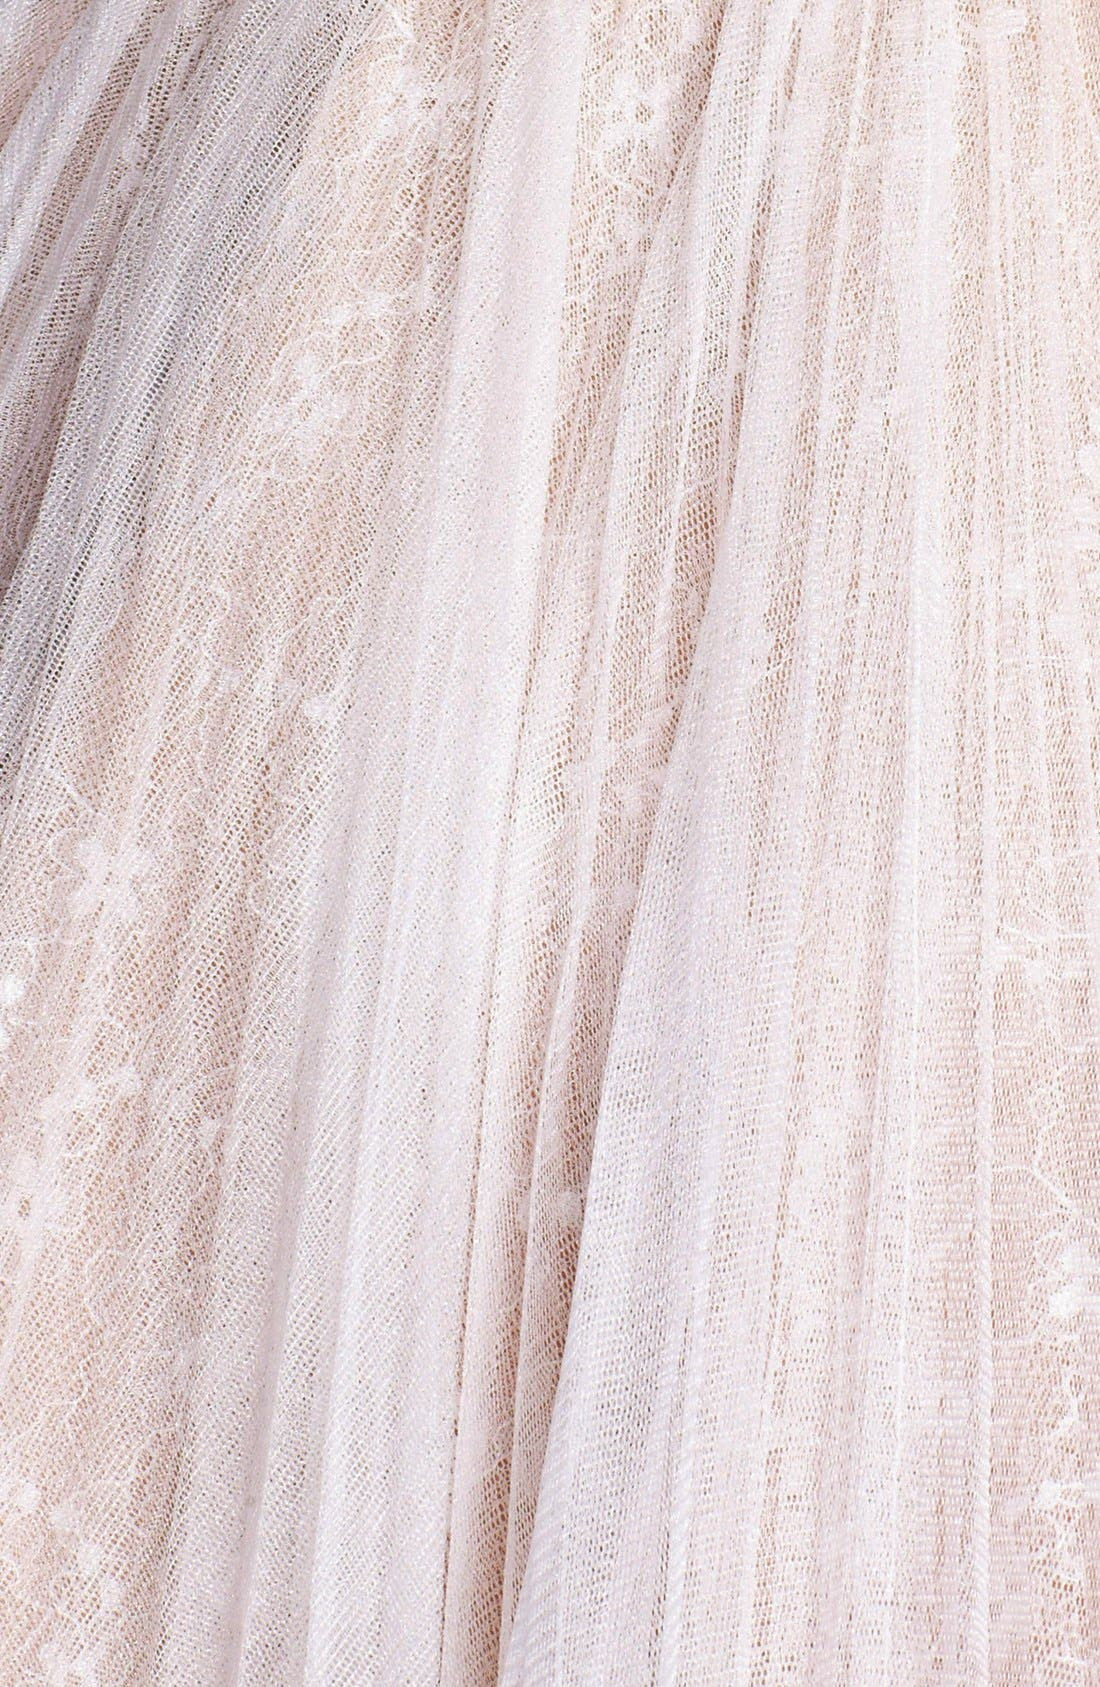 Alternate Image 3  - Sherri Hill Embellished Lace Fit & Flare Dress